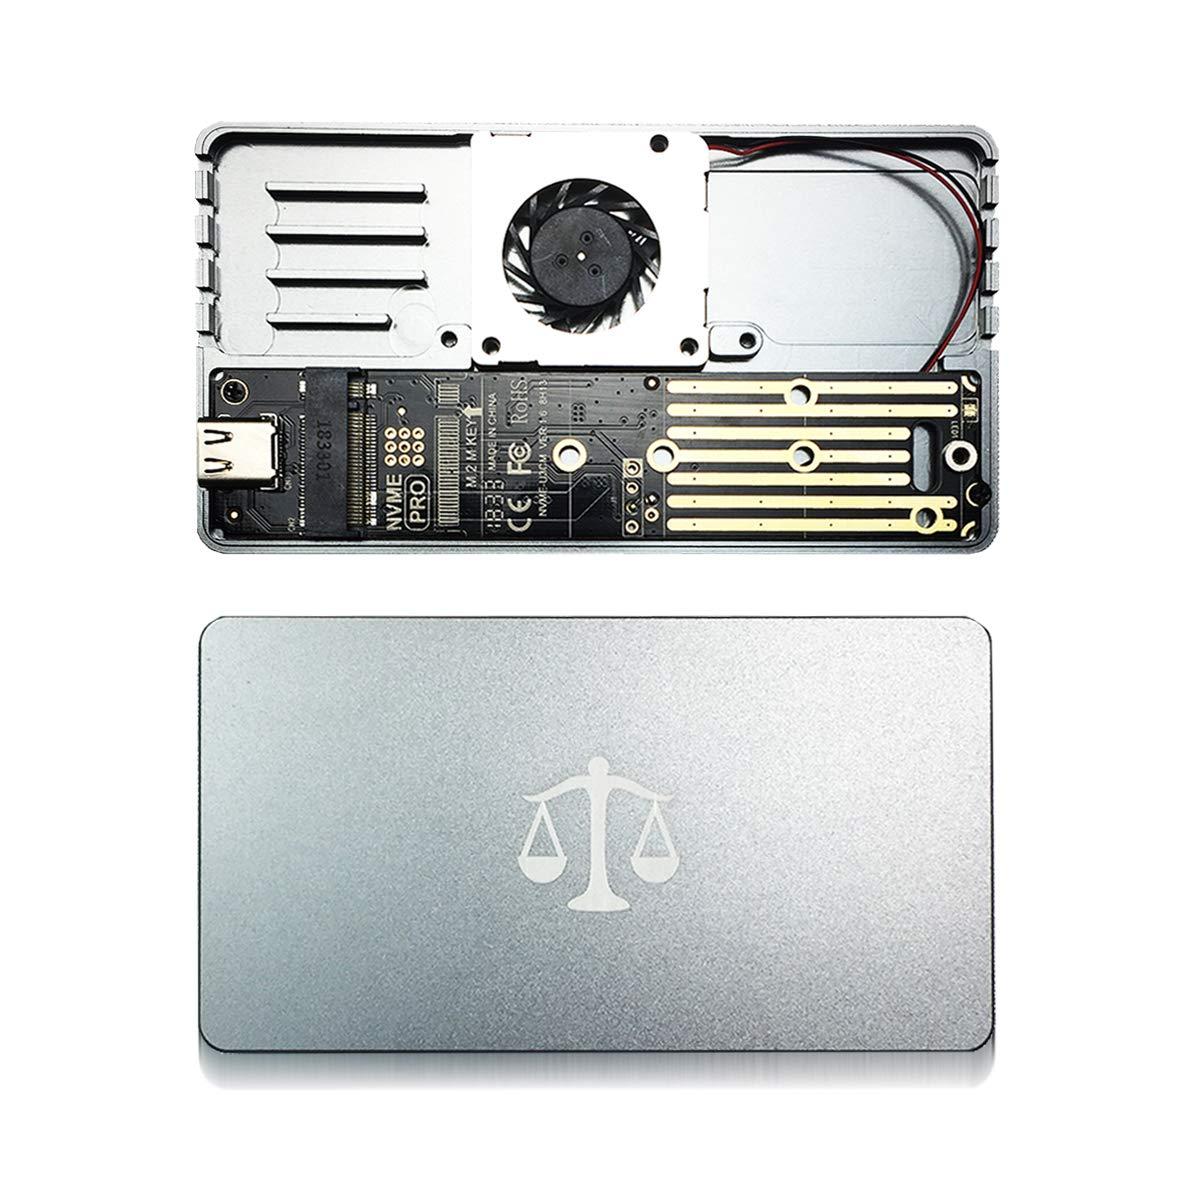 GLOTRENDS Scorpio M.2 NVME a USB C Caja Enclosure Case para M.2 NVME SSD